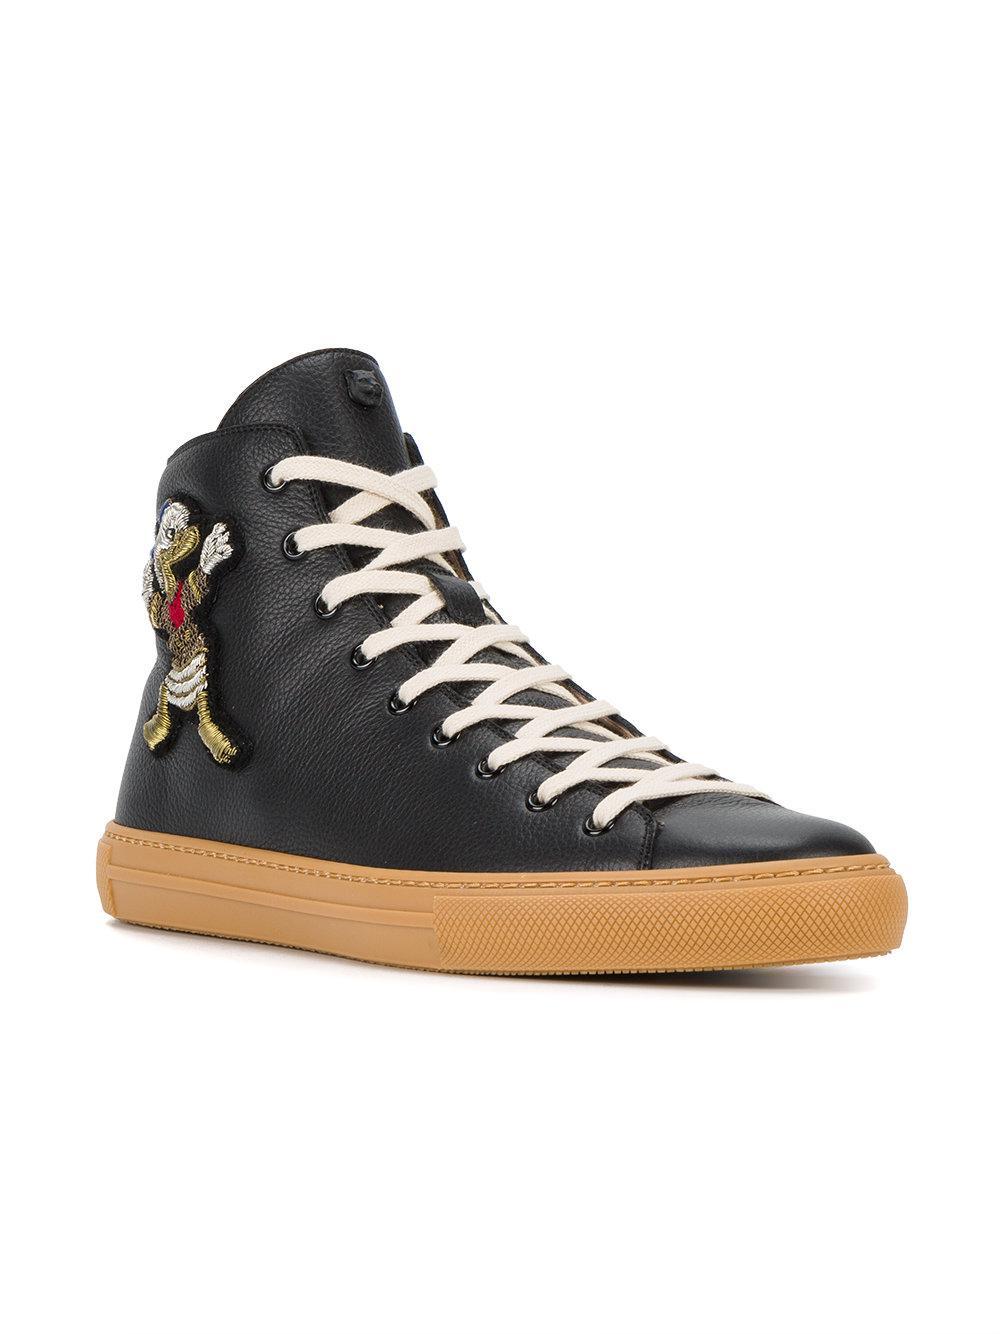 4980f02b54c Gucci Donald Duck Hi-top Sneakers in Black for Men - Lyst